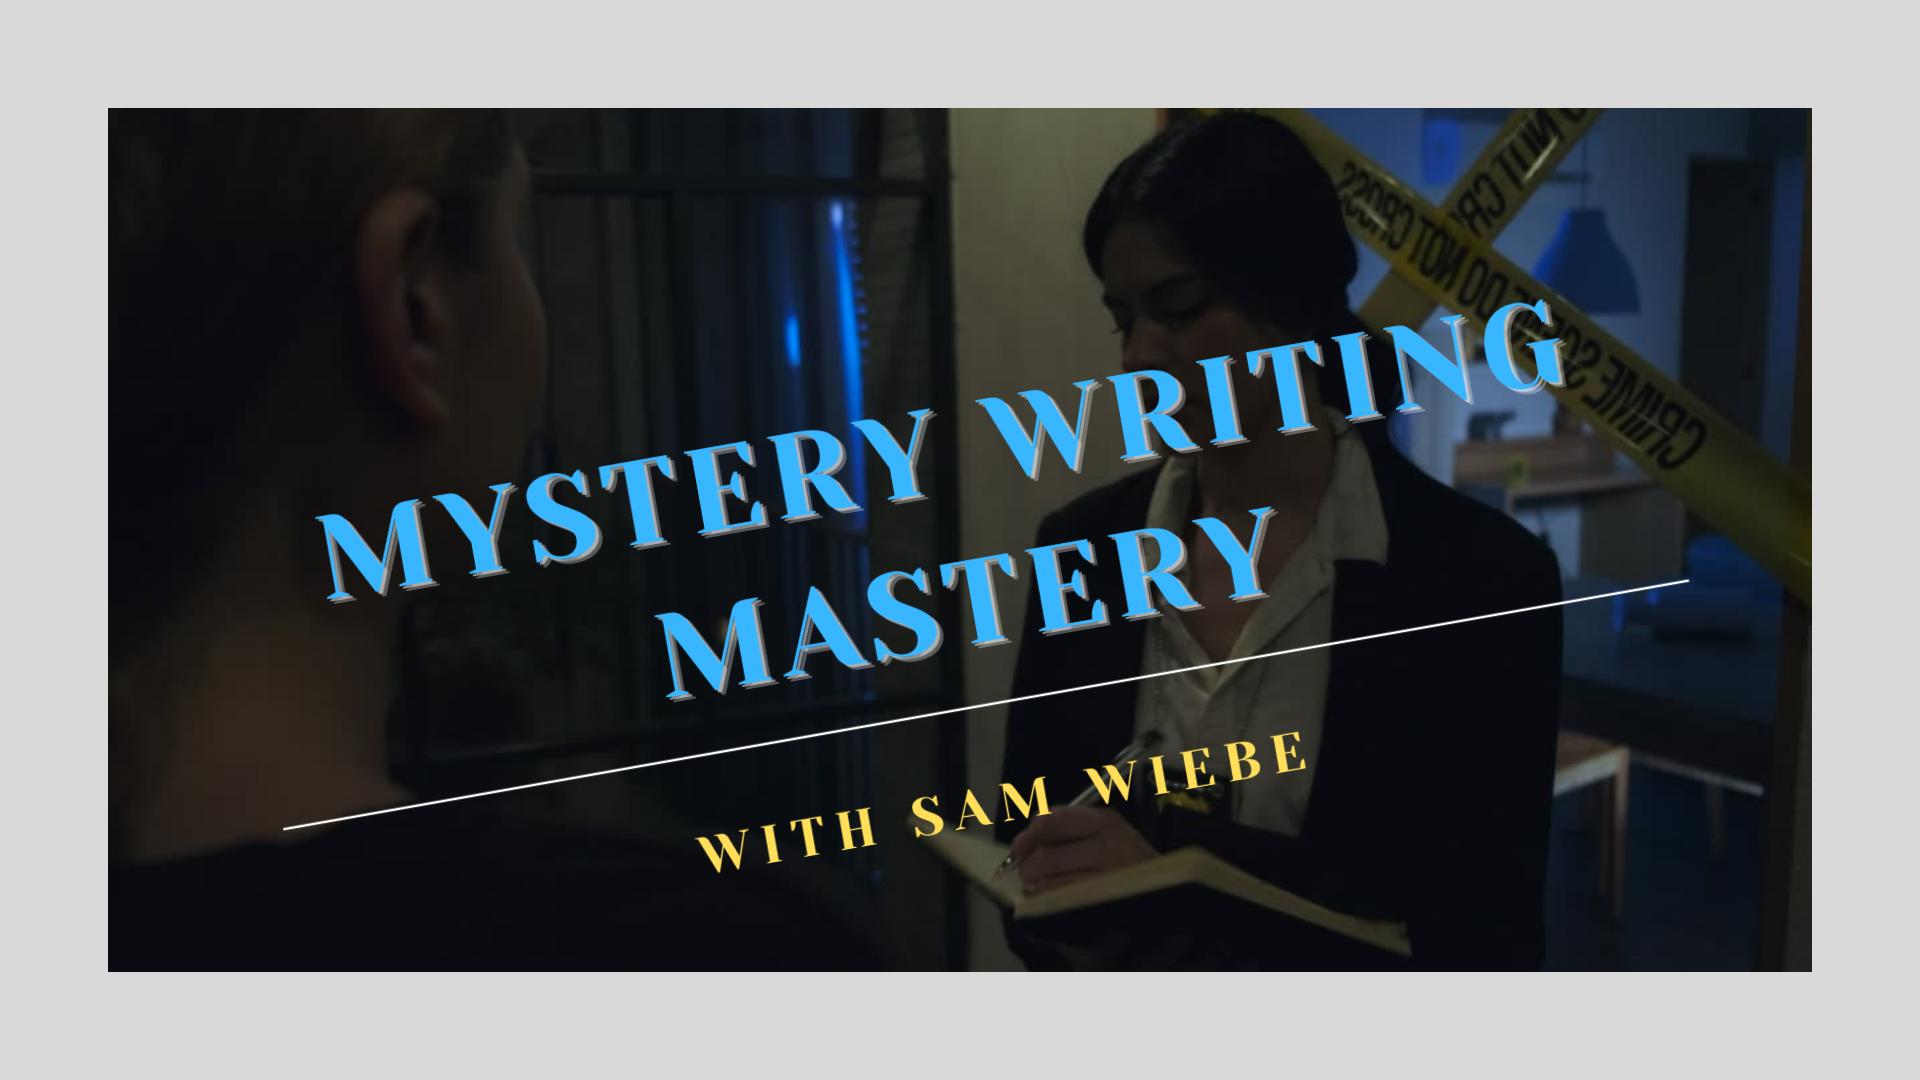 Mystery Writing Mastery